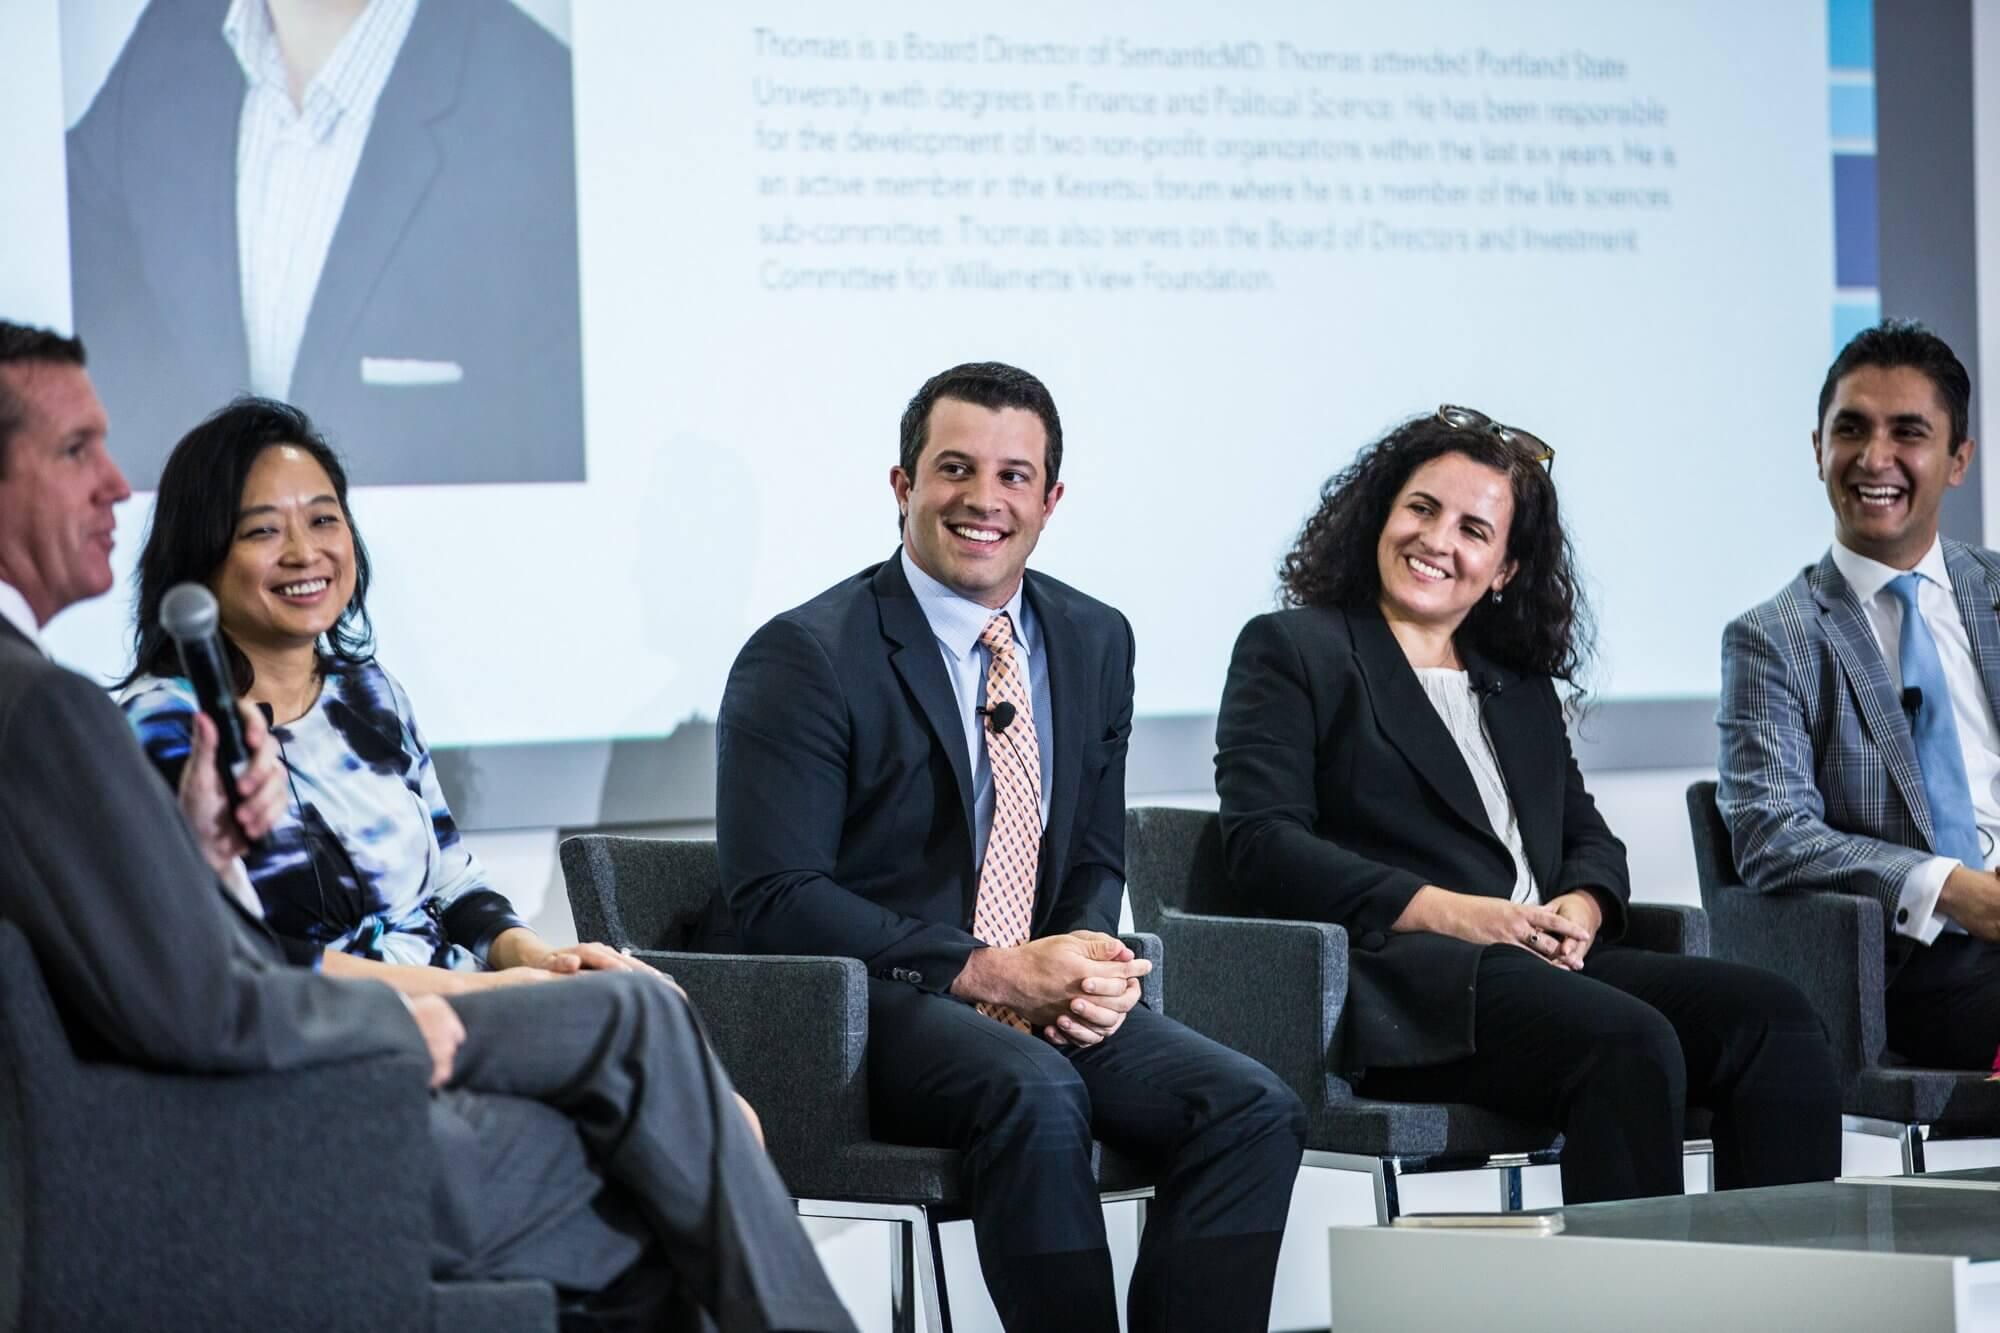 (Left to right) Moderator William F. McKeon and panelists Lynda Chin, M.D., Thomas DeSouza, Juliana Garaizar, and Farzad Soleimani, M.D.